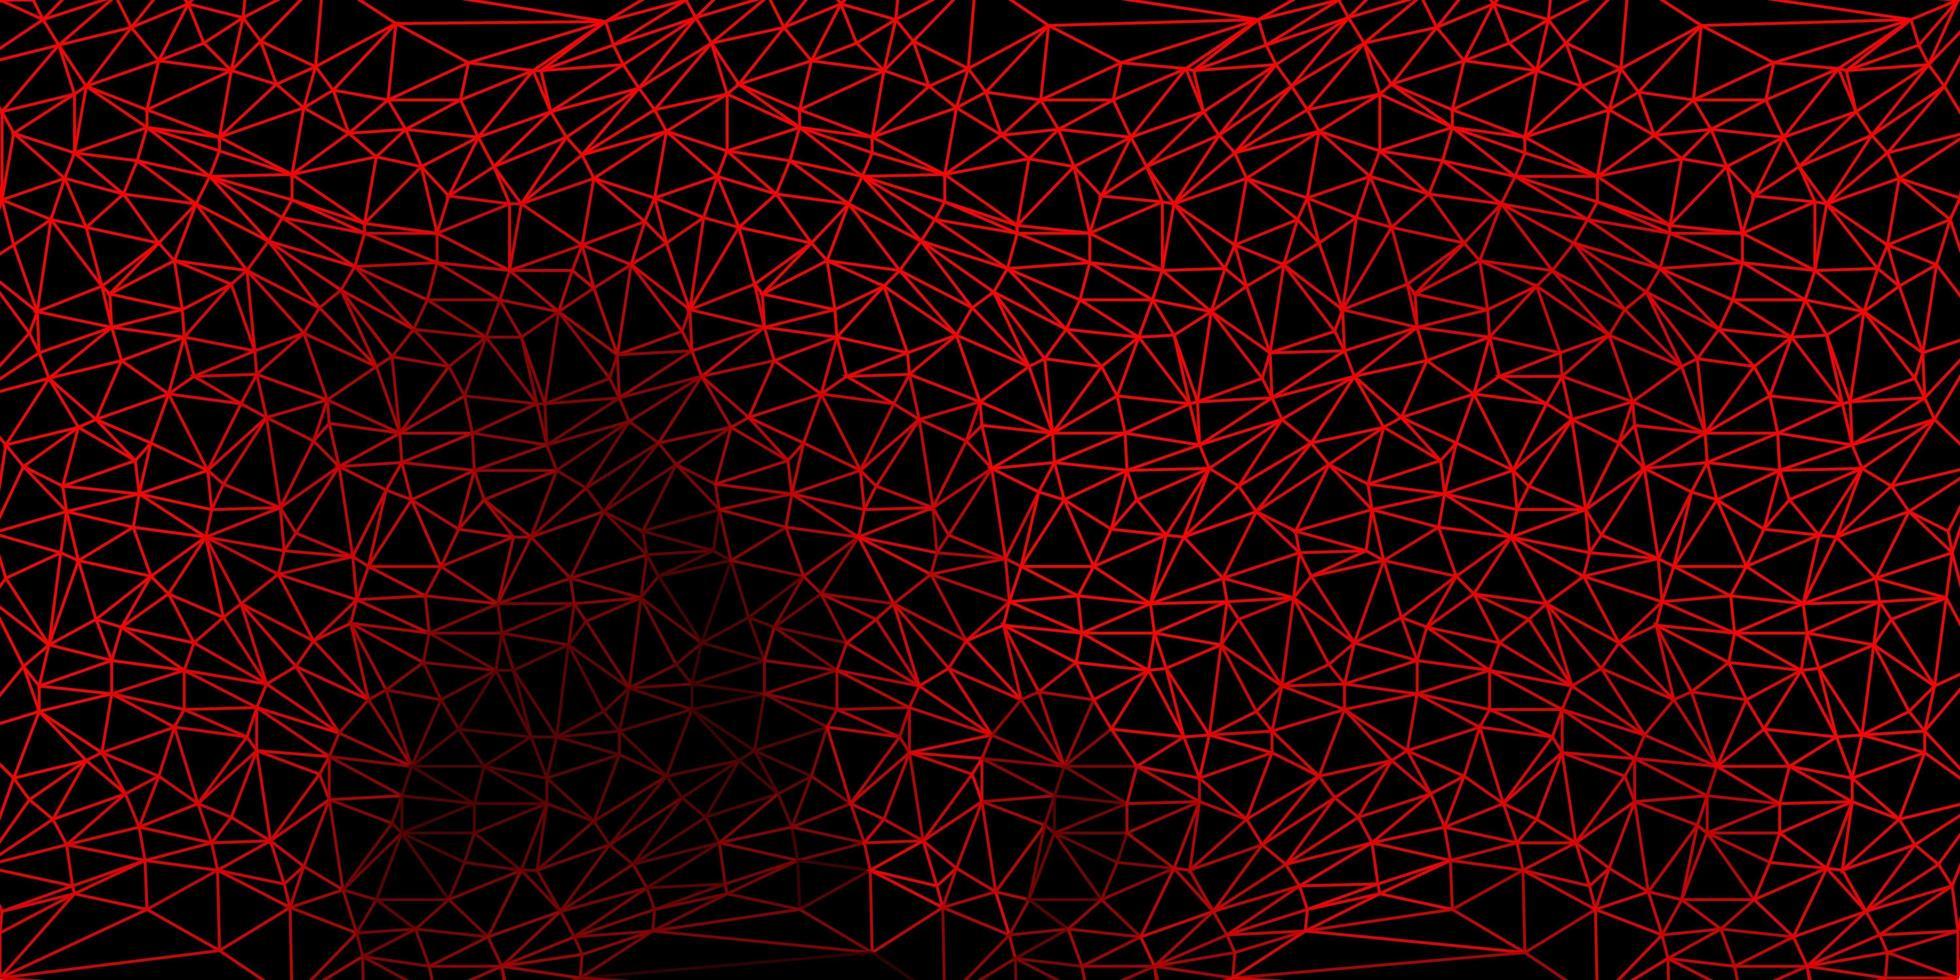 mörkröd gradient polygon design. vektor